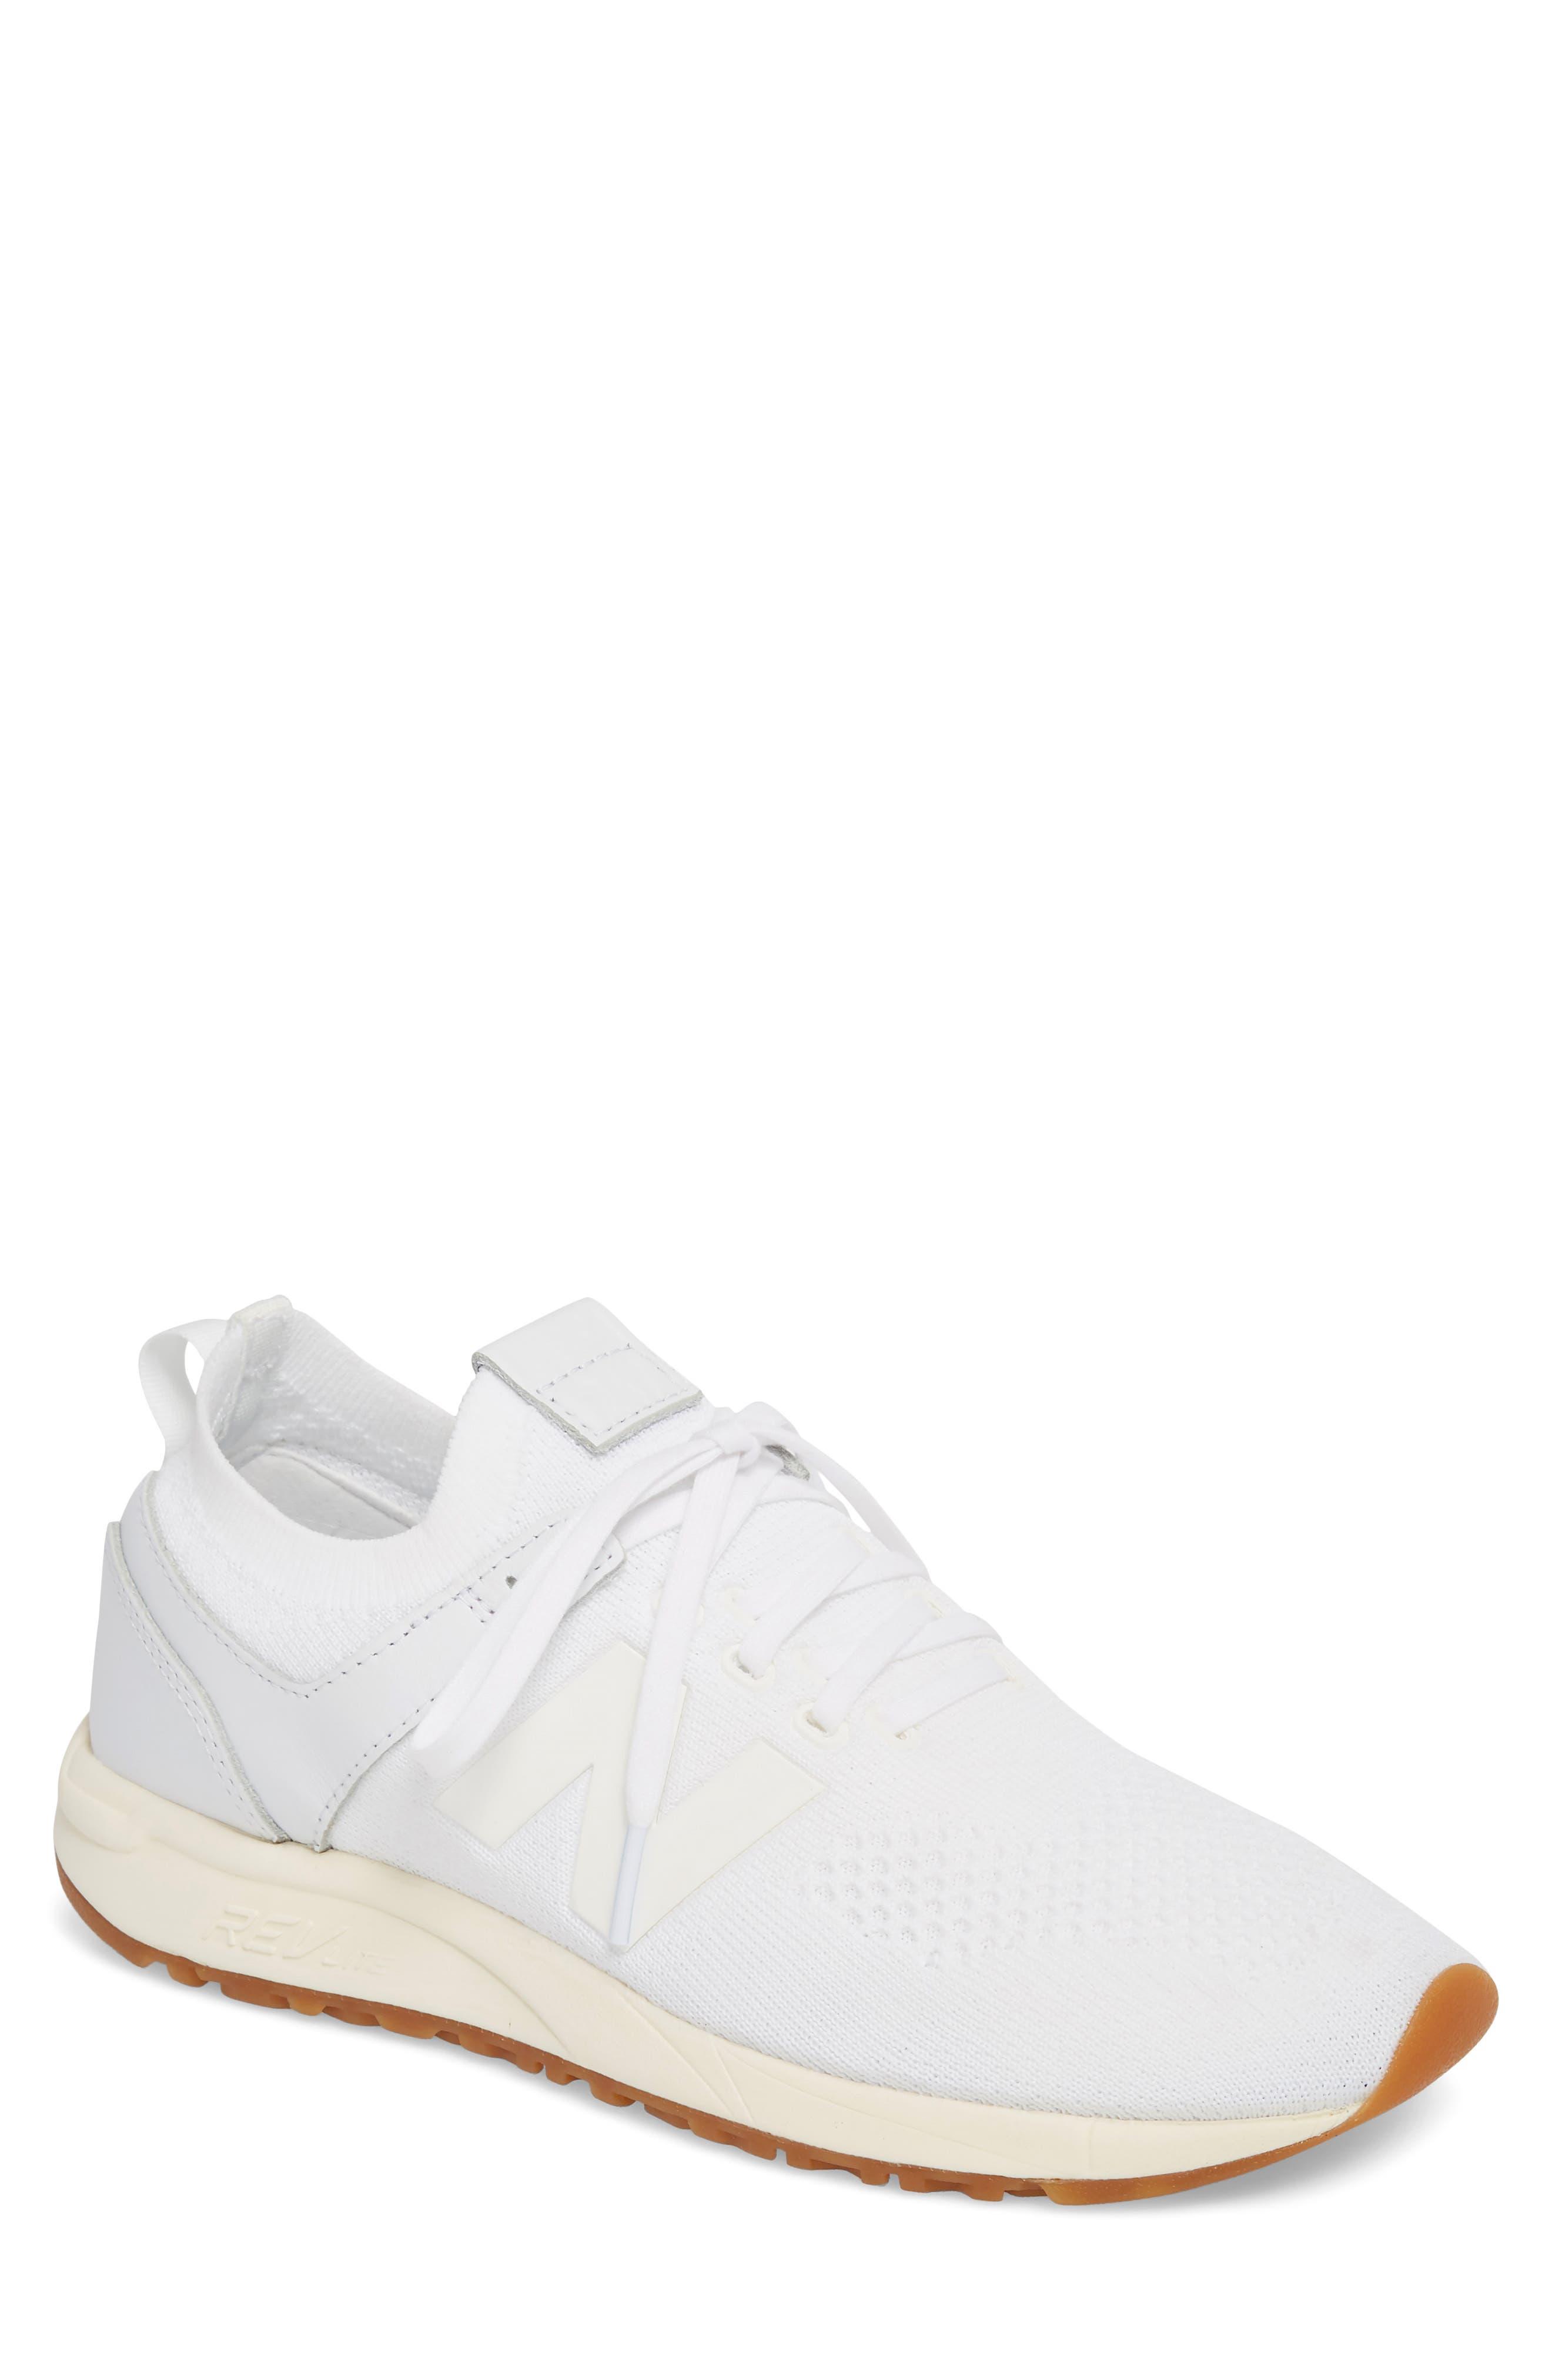 Main Image - New Balance 247 Decon Knit Sneaker (Men)